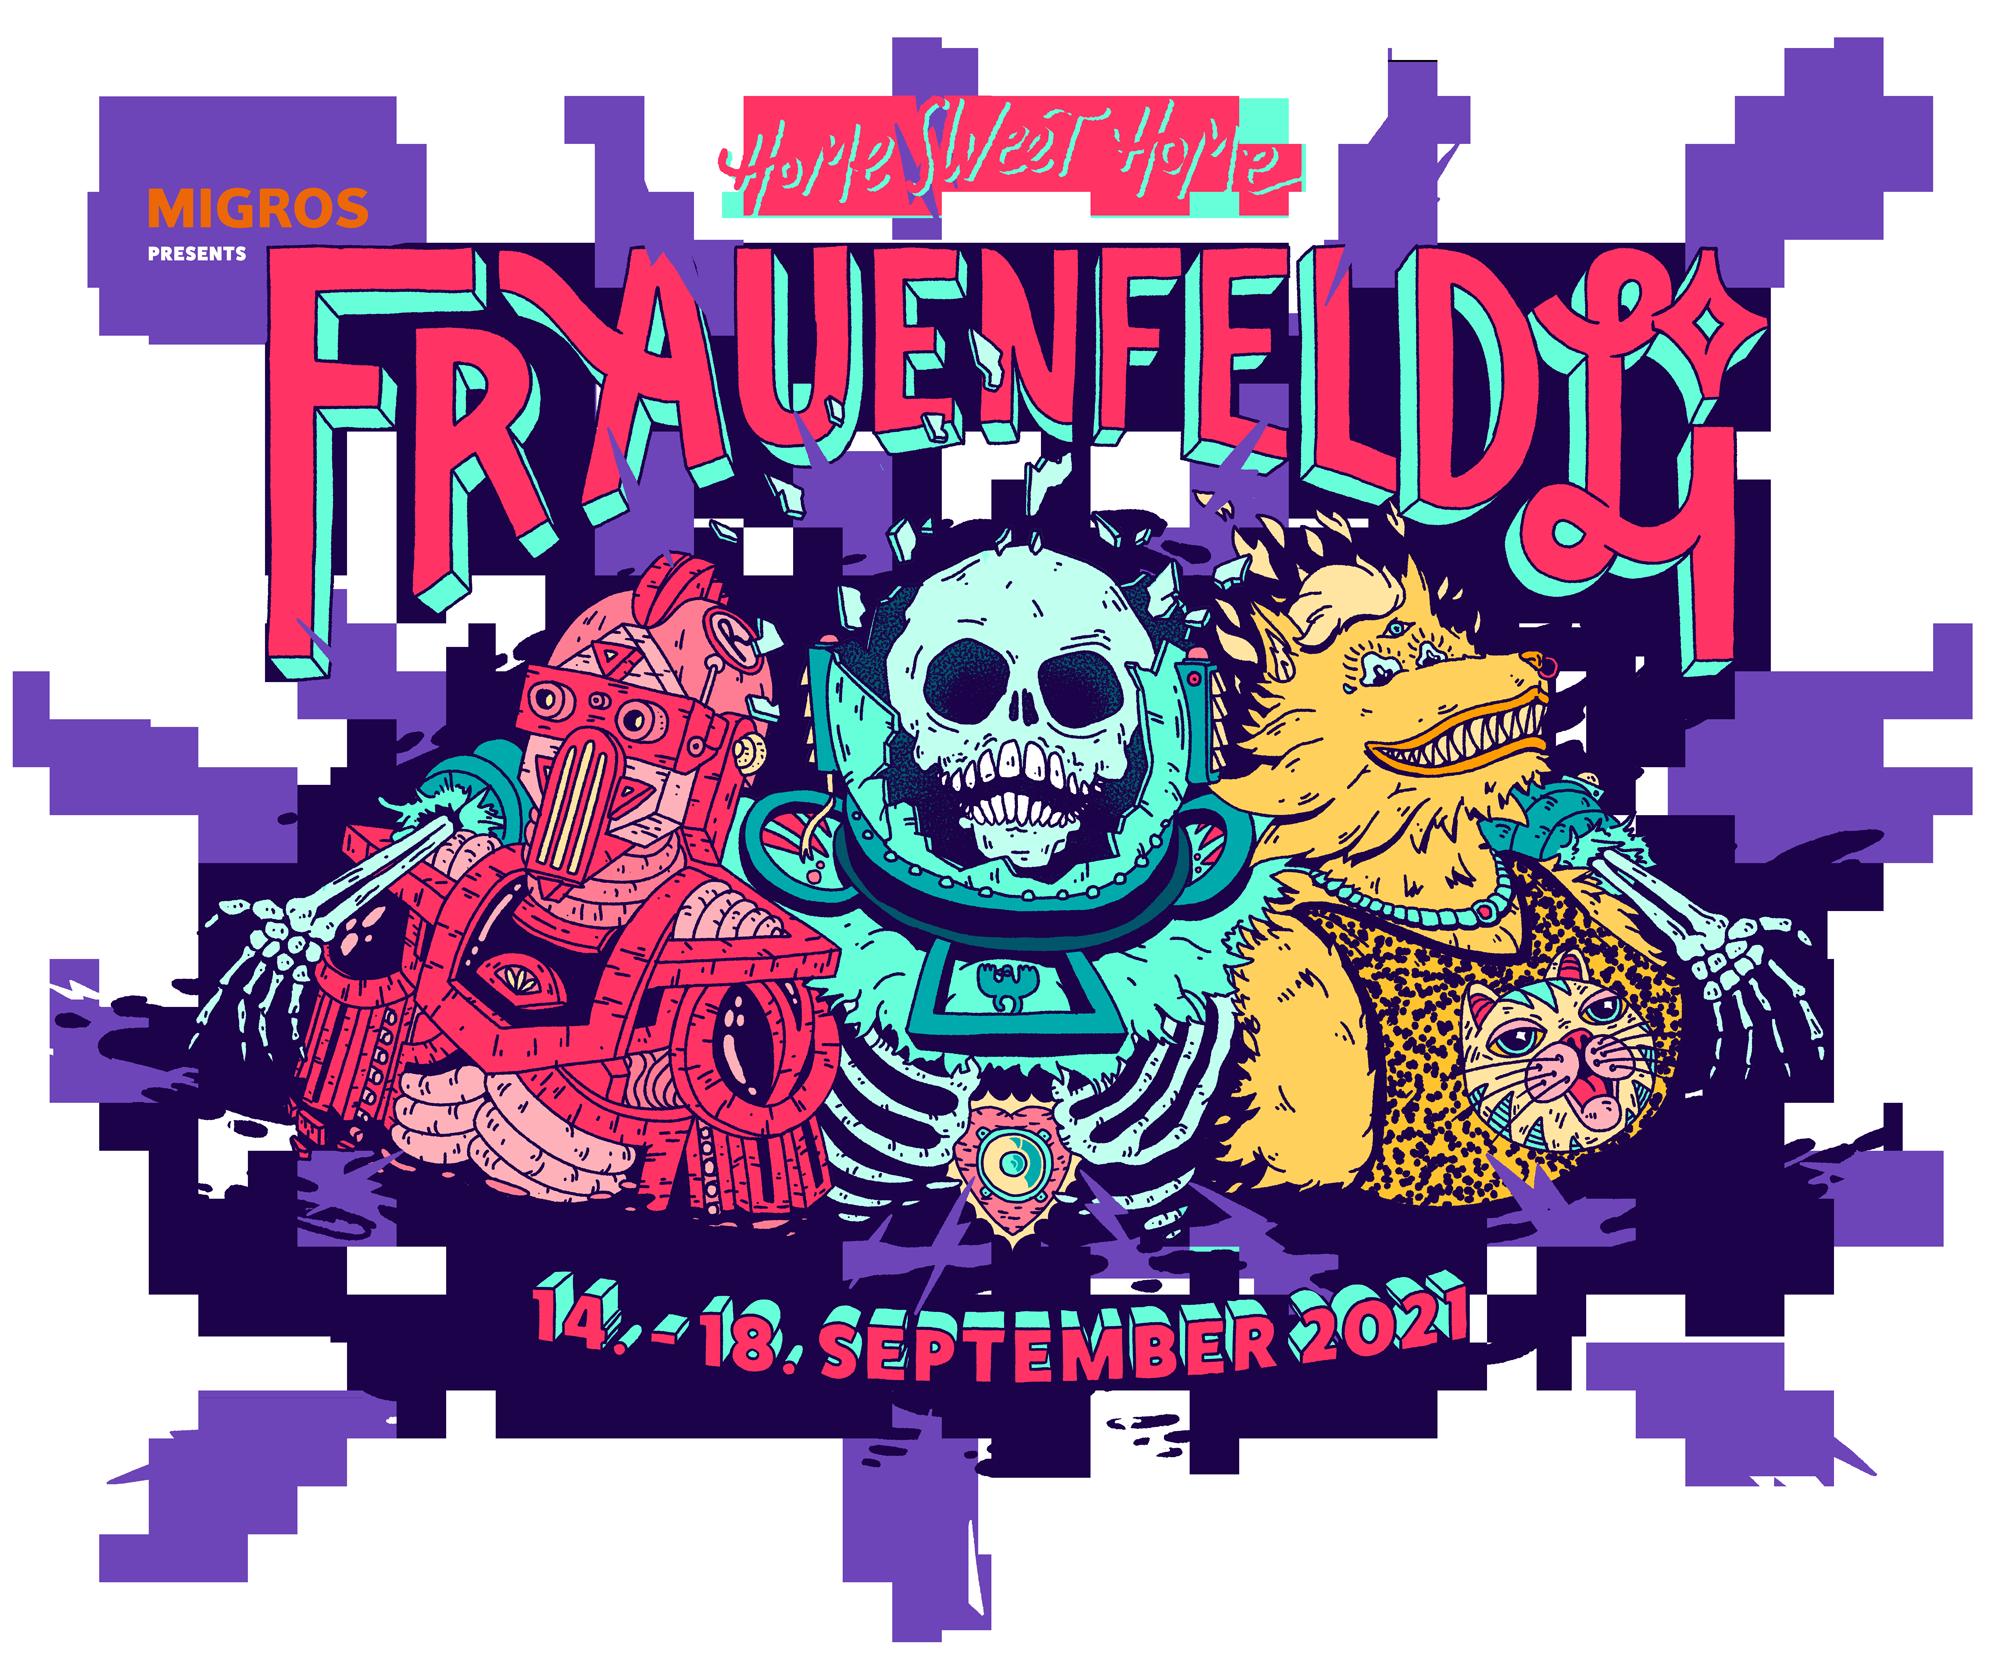 openair frauenfeld 2021 dates